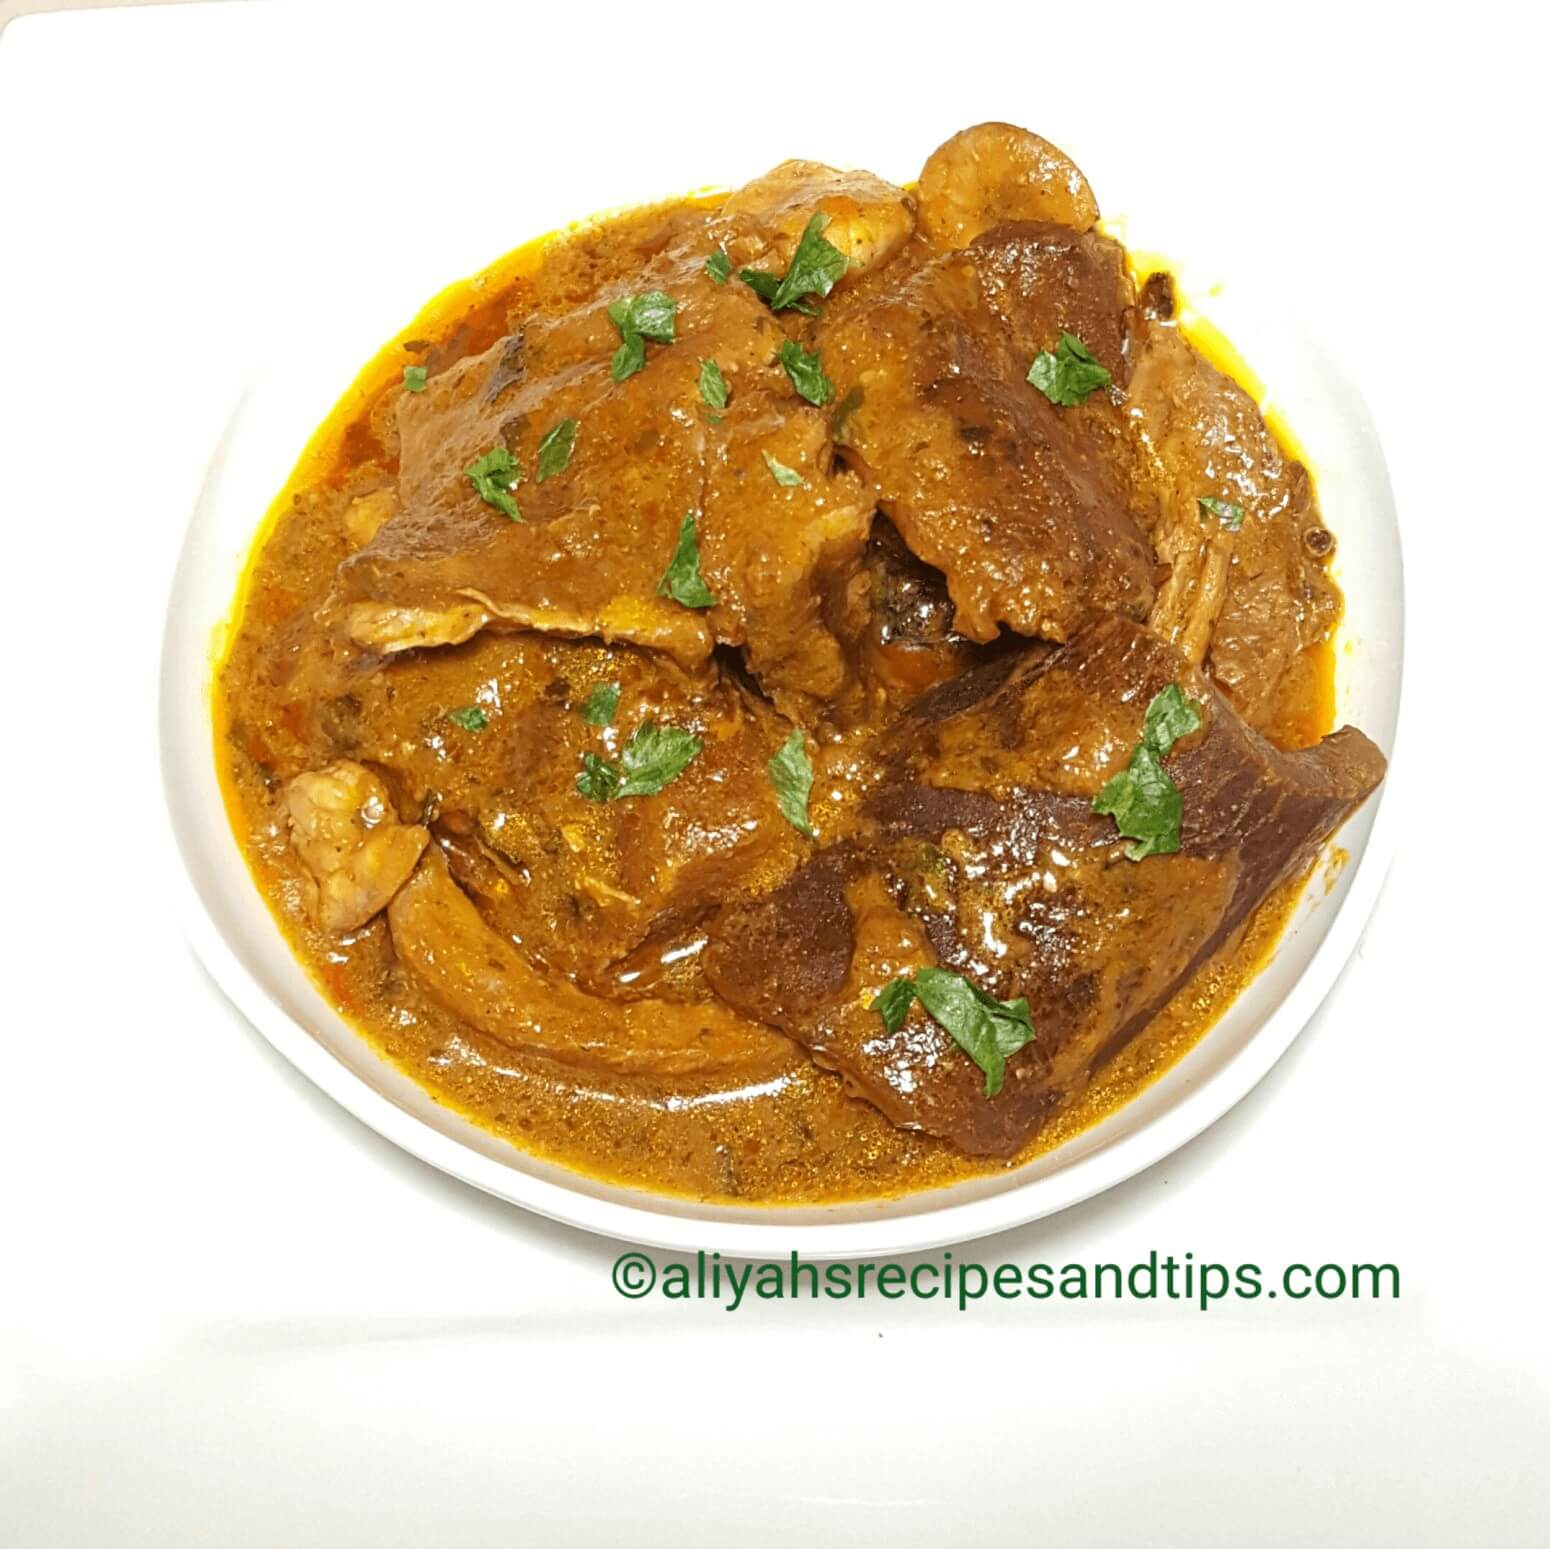 how to cook ogbono, Ogbono soup recipe, ogbono soup, stockfish, Ogbono, how to cook ogbono Nigerian Style, Nigerian soup, Nigerian Ogbono soupEba, Igbo, Okra, fufu, homemade, bitterleaf